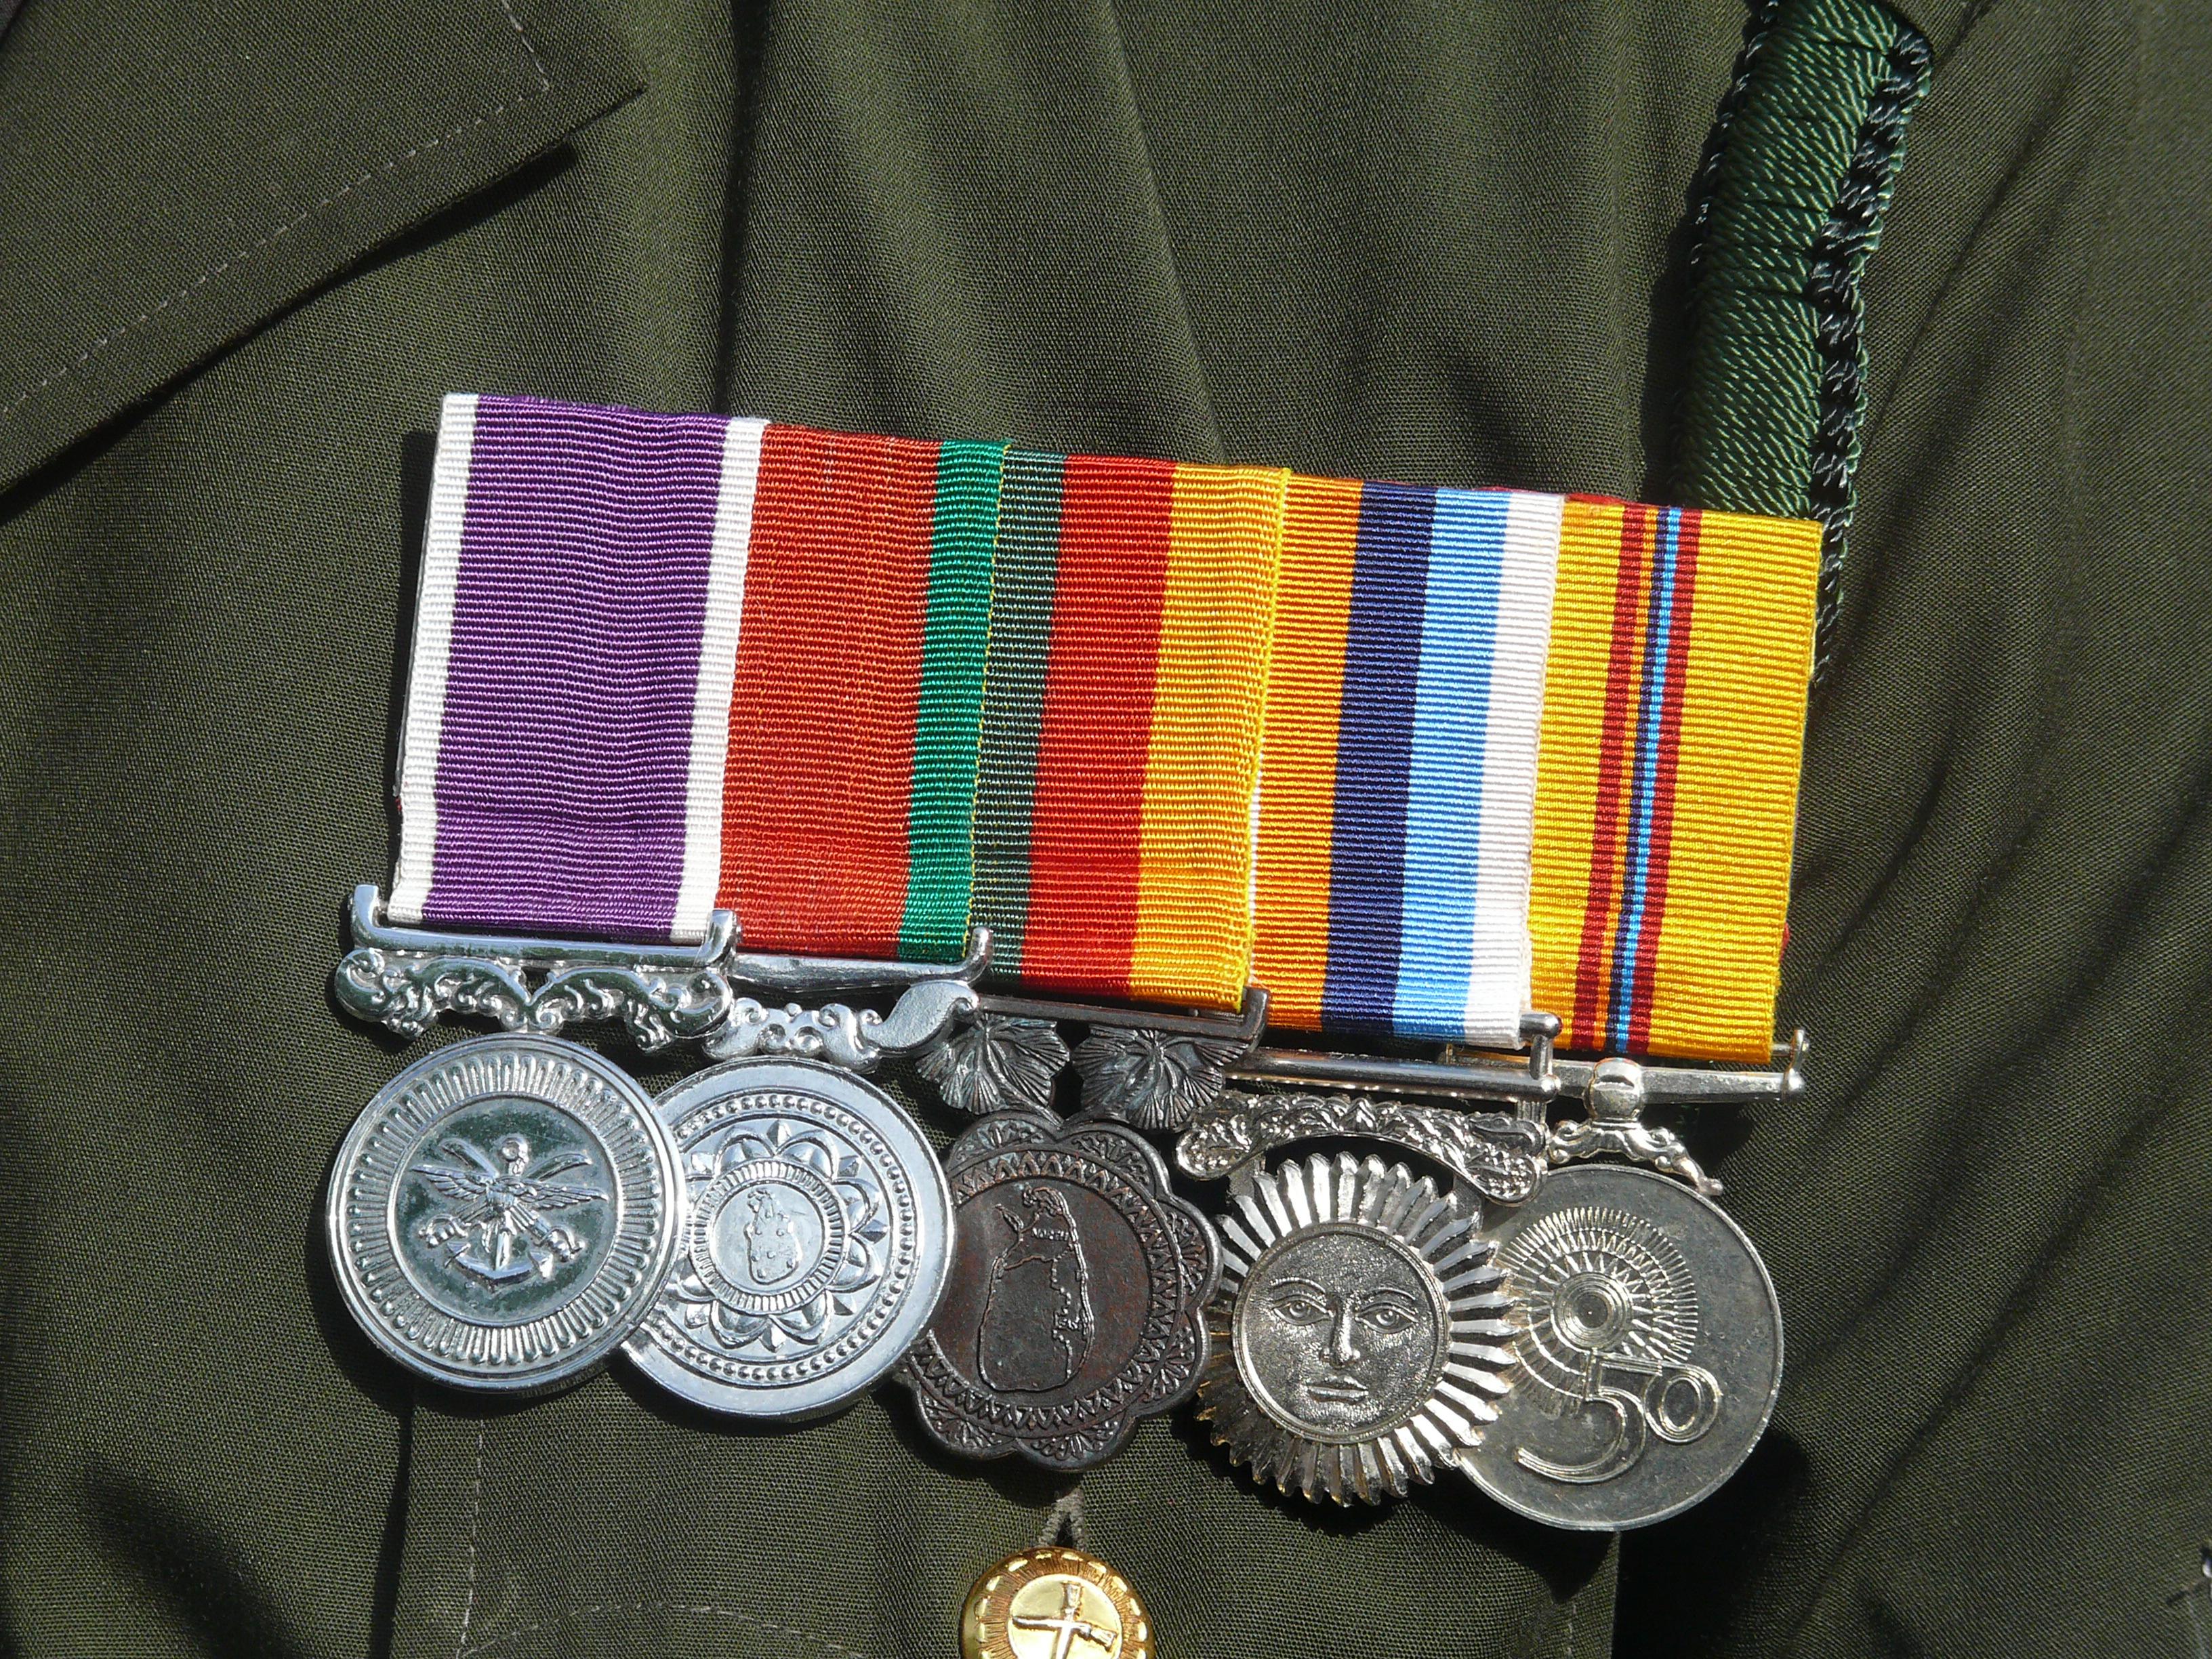 Military Awards And Decorations Of Sri Lanka Wikipedia